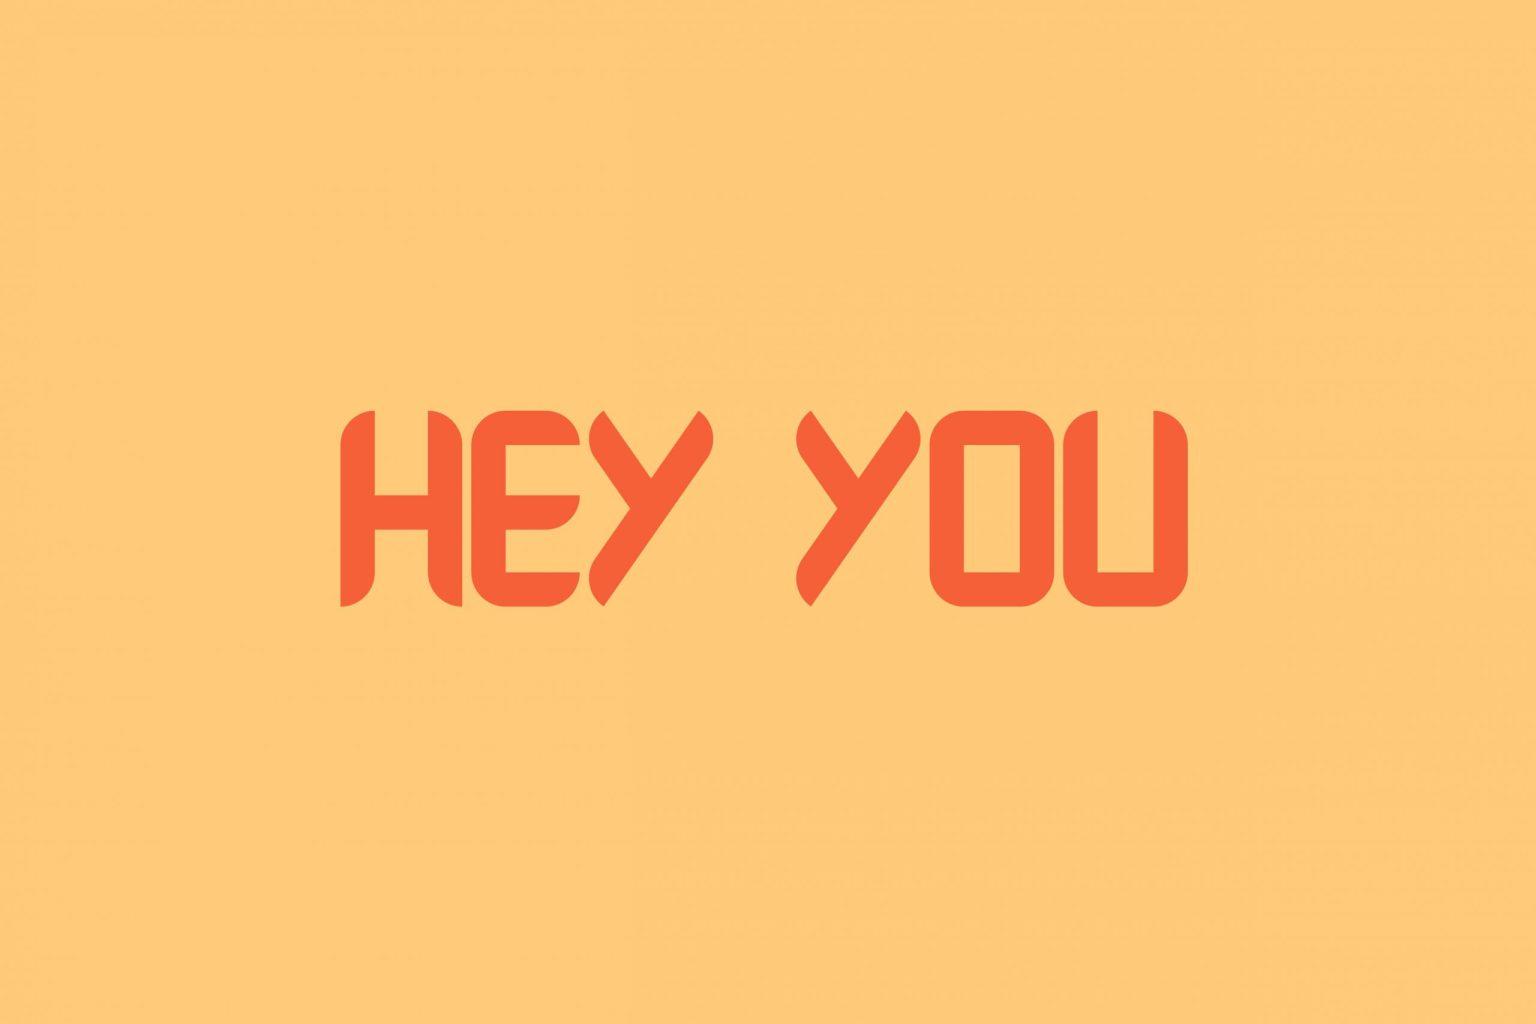 Hey You Display Font